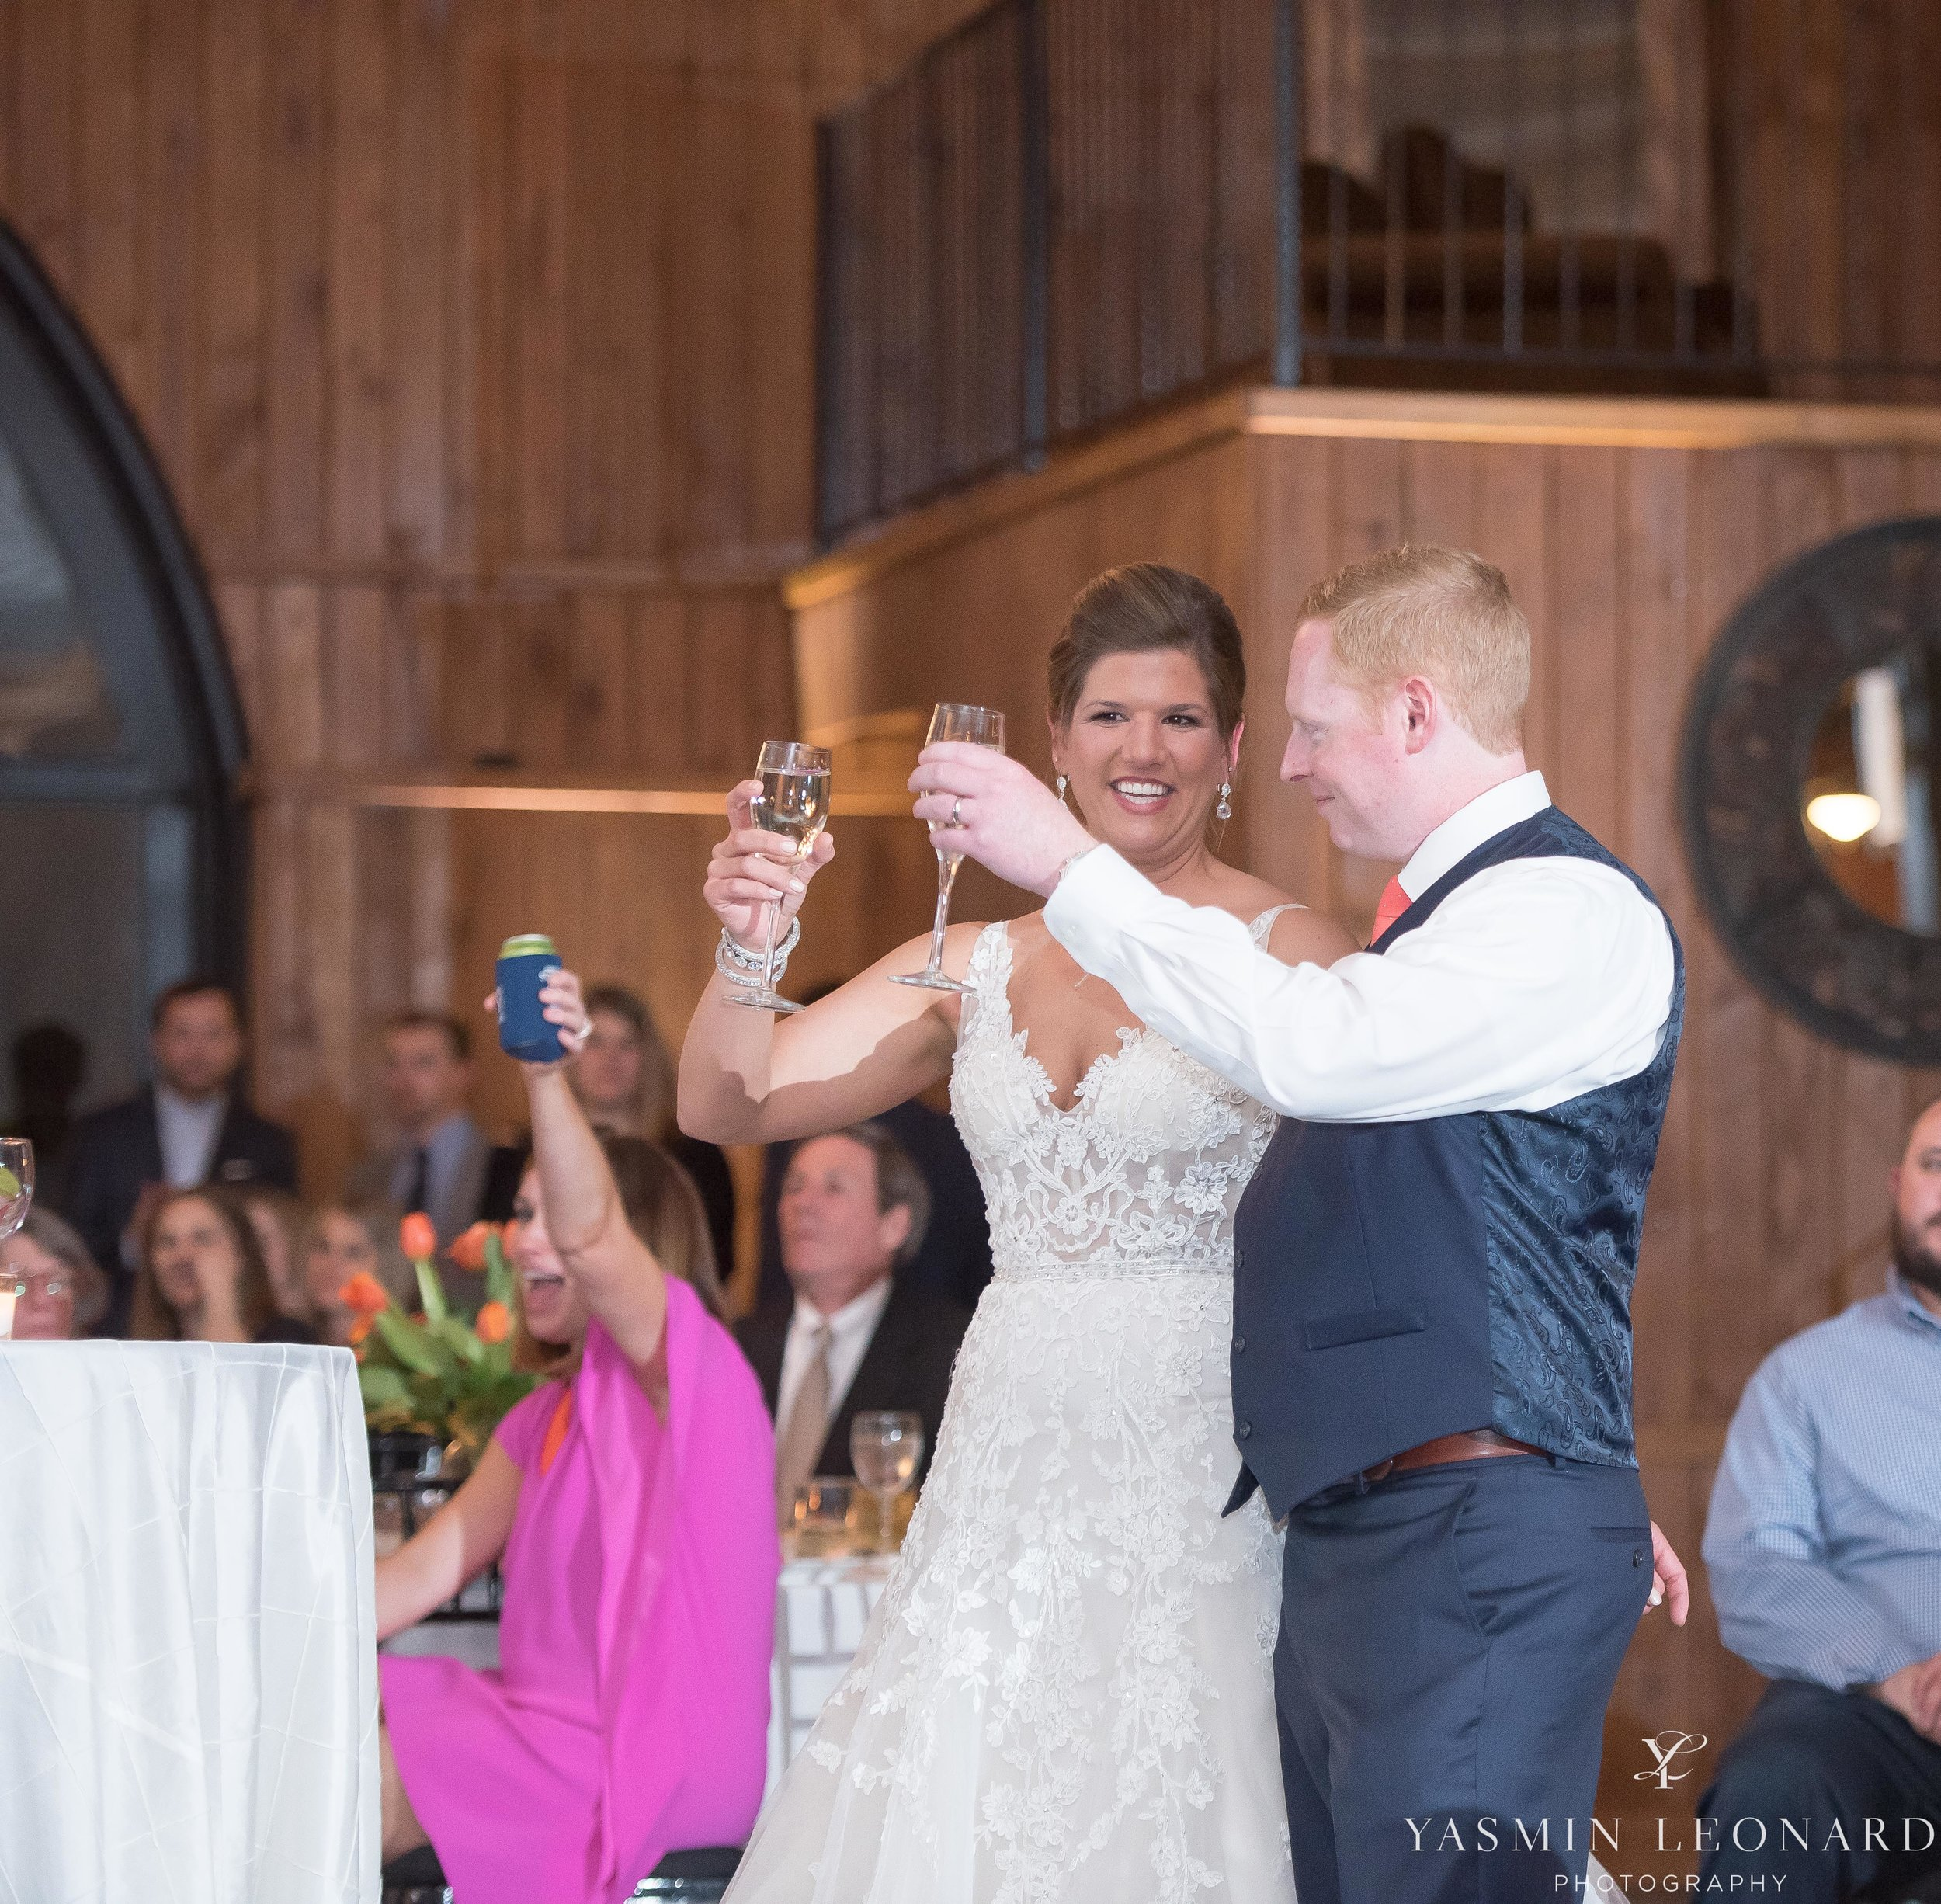 Adaumont Farm - Adaumont Farm Weddings - Trinity Weddings - NC Weddings - Yasmin Leonard Photography-66.jpg